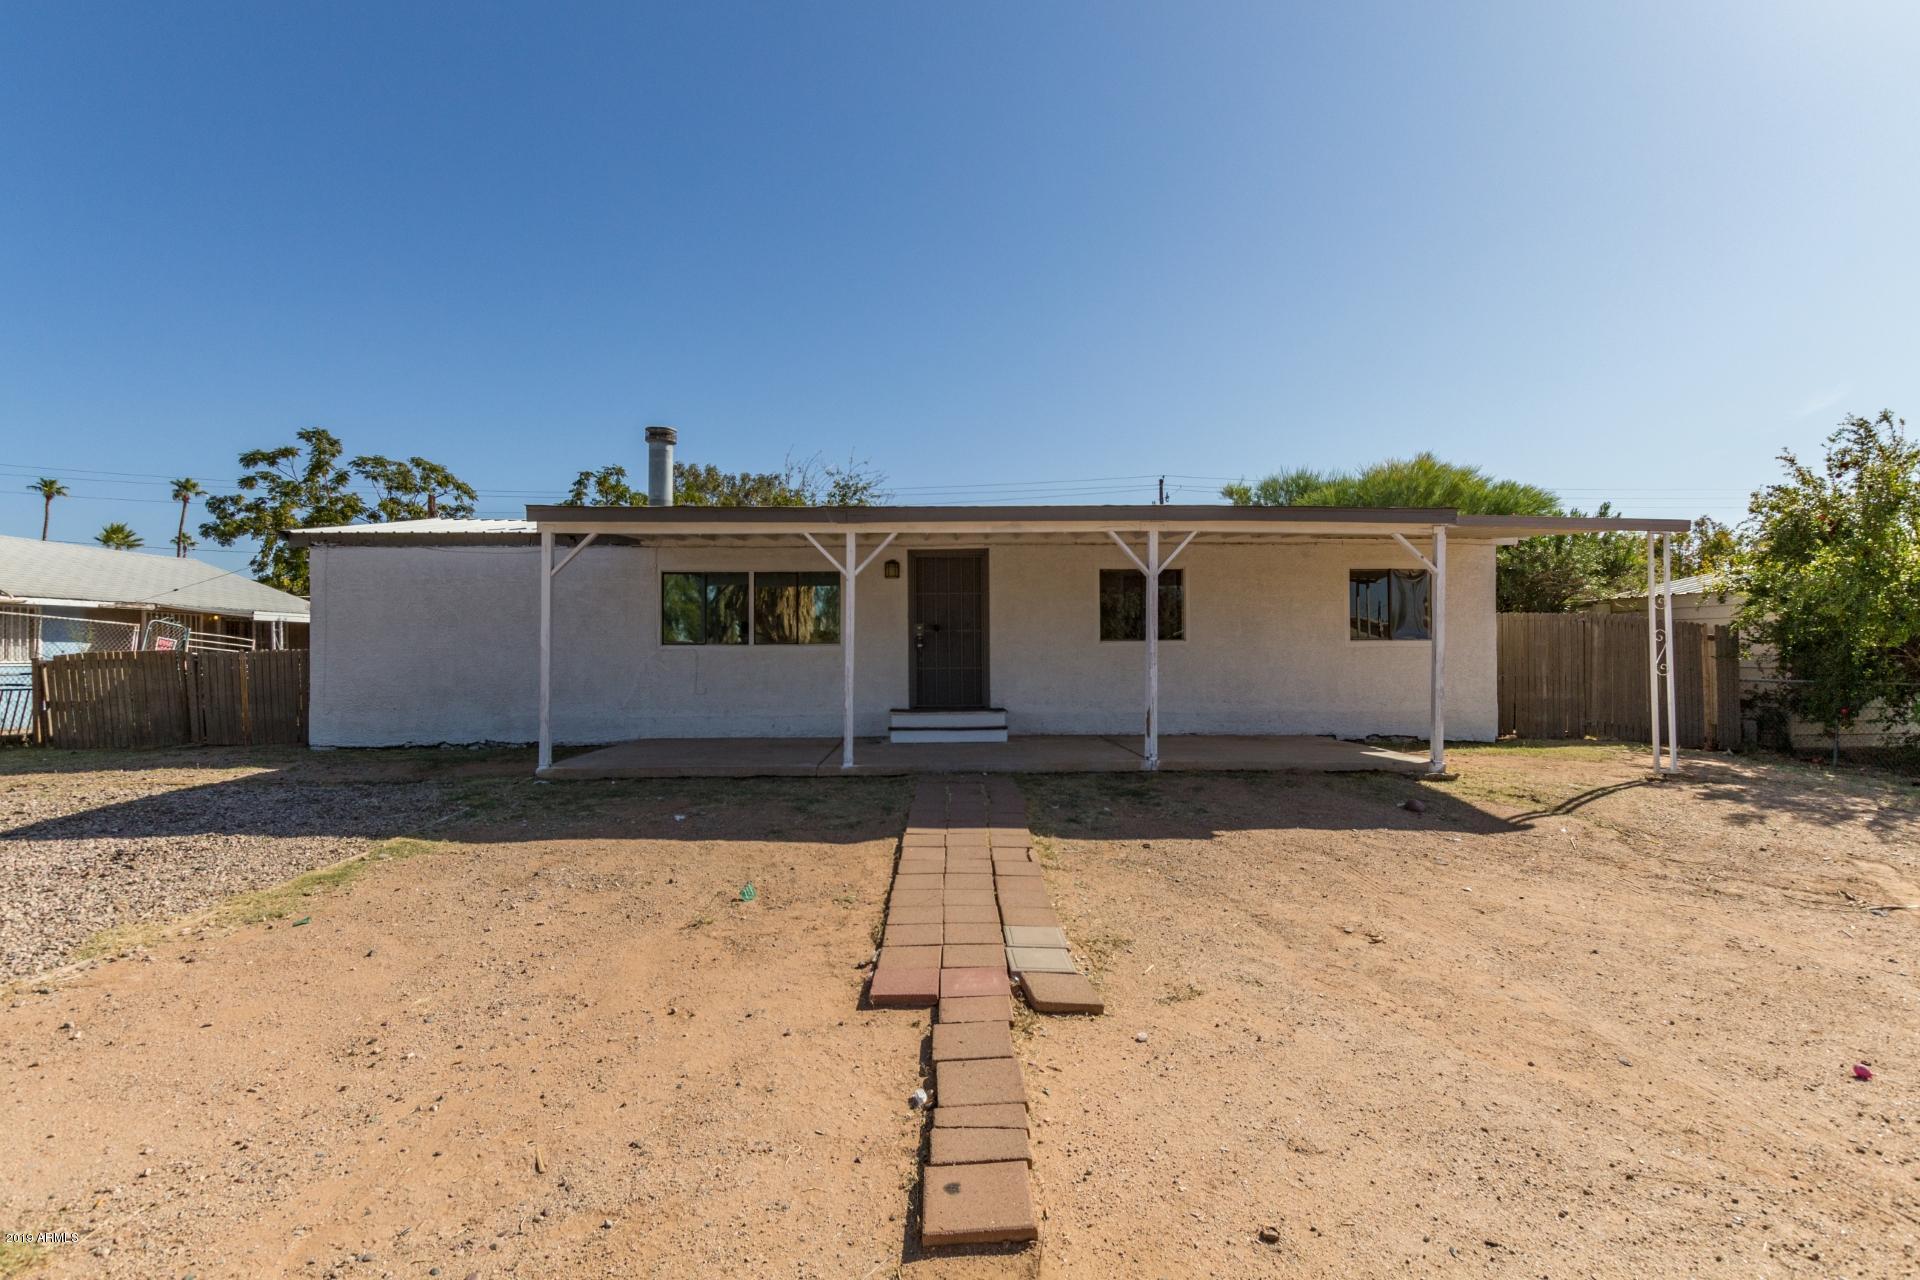 Photo of 315 S 83RD Place, Mesa, AZ 85208